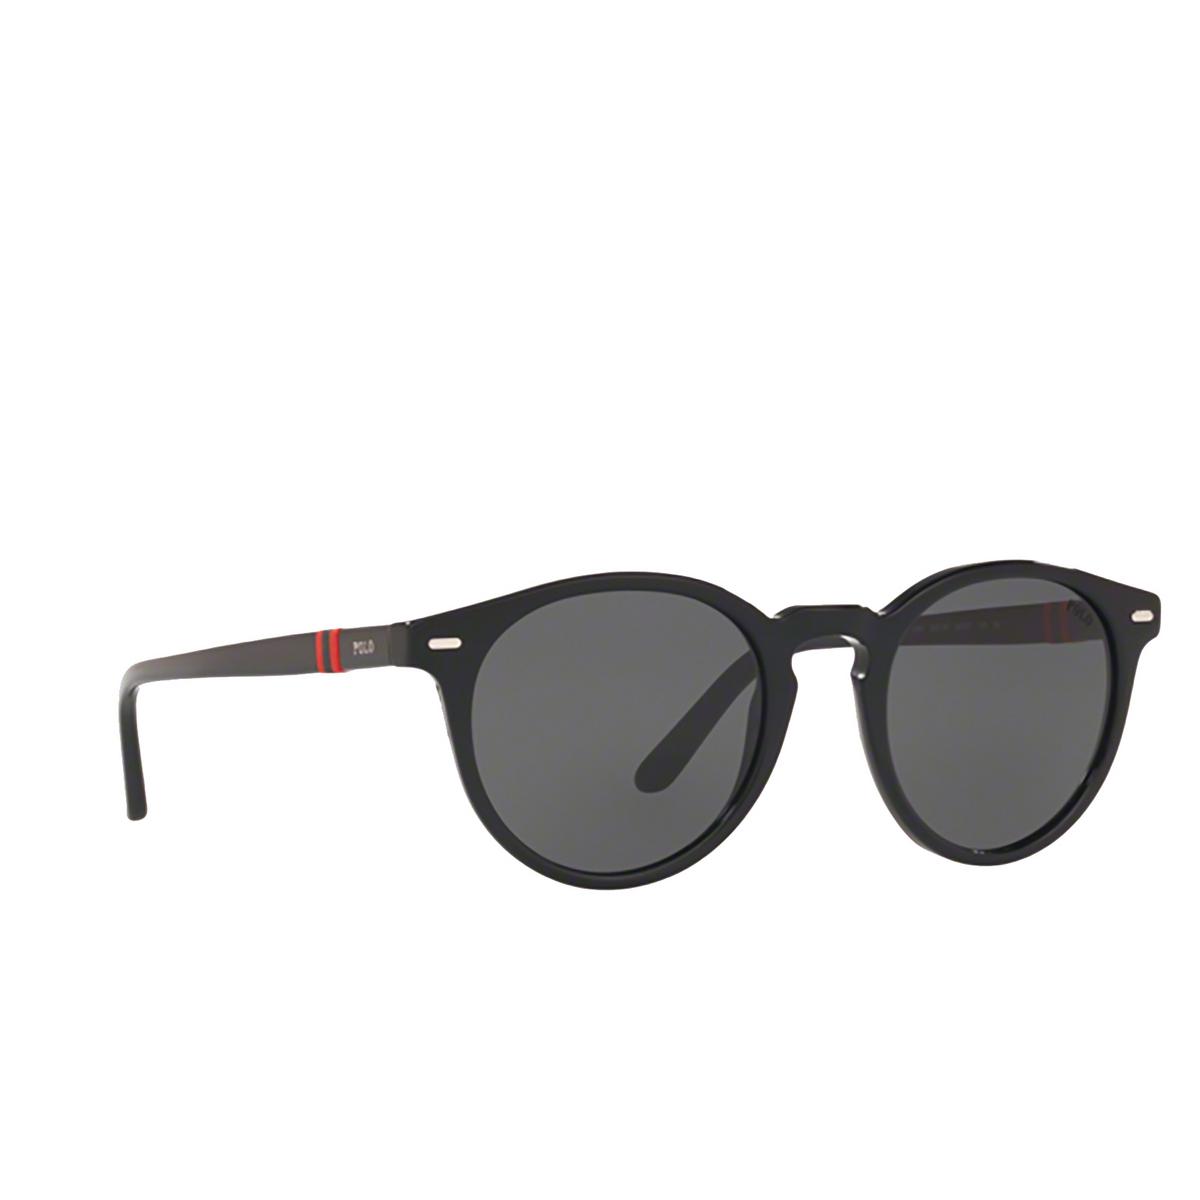 Polo Ralph Lauren® Round Sunglasses: PH4151 color Shiny Black 500187 - three-quarters view.